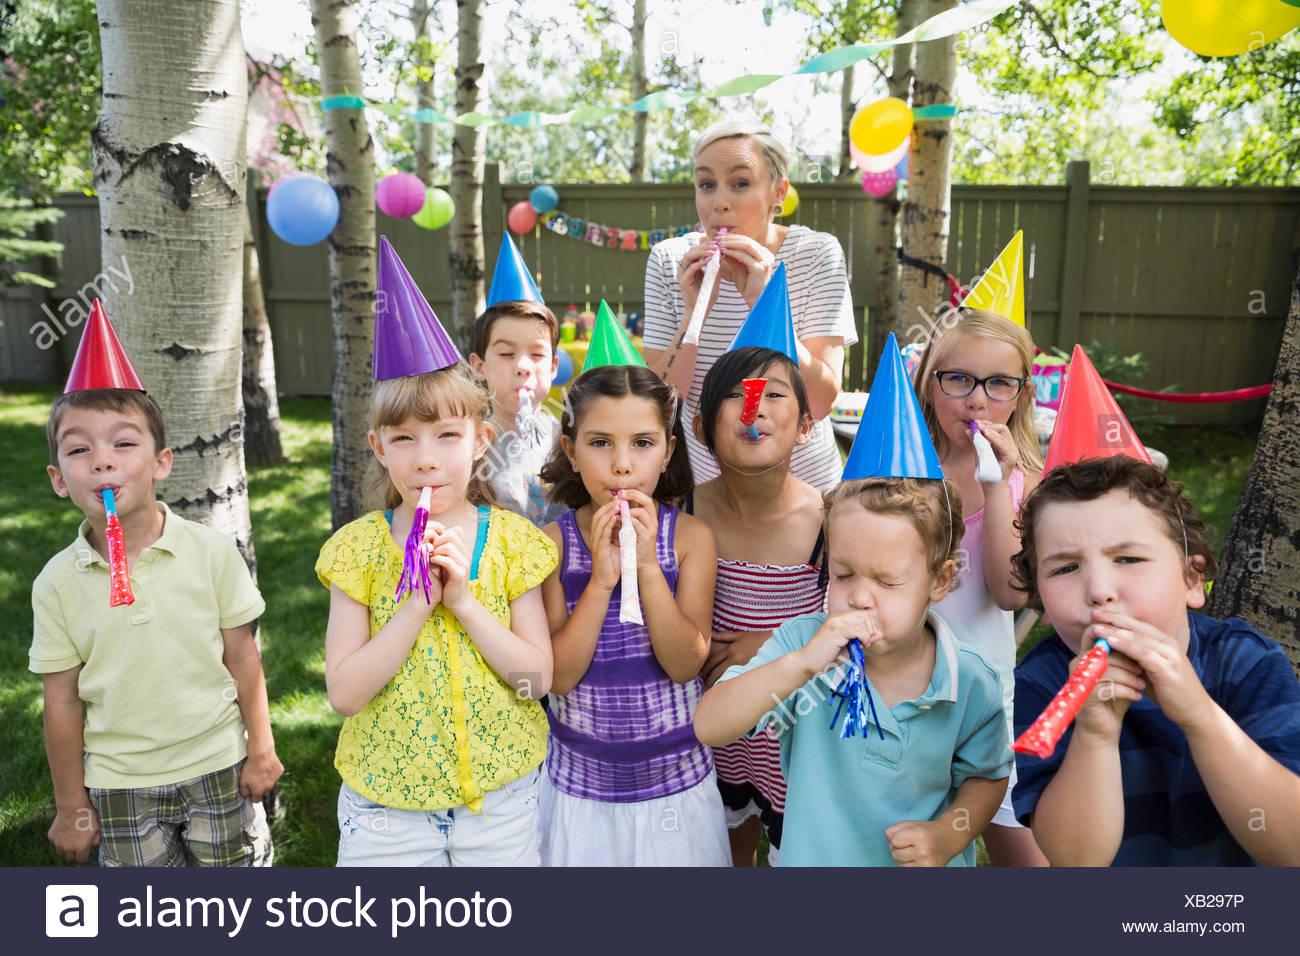 Portrait woman kids party hats blowing party favors - Stock Image